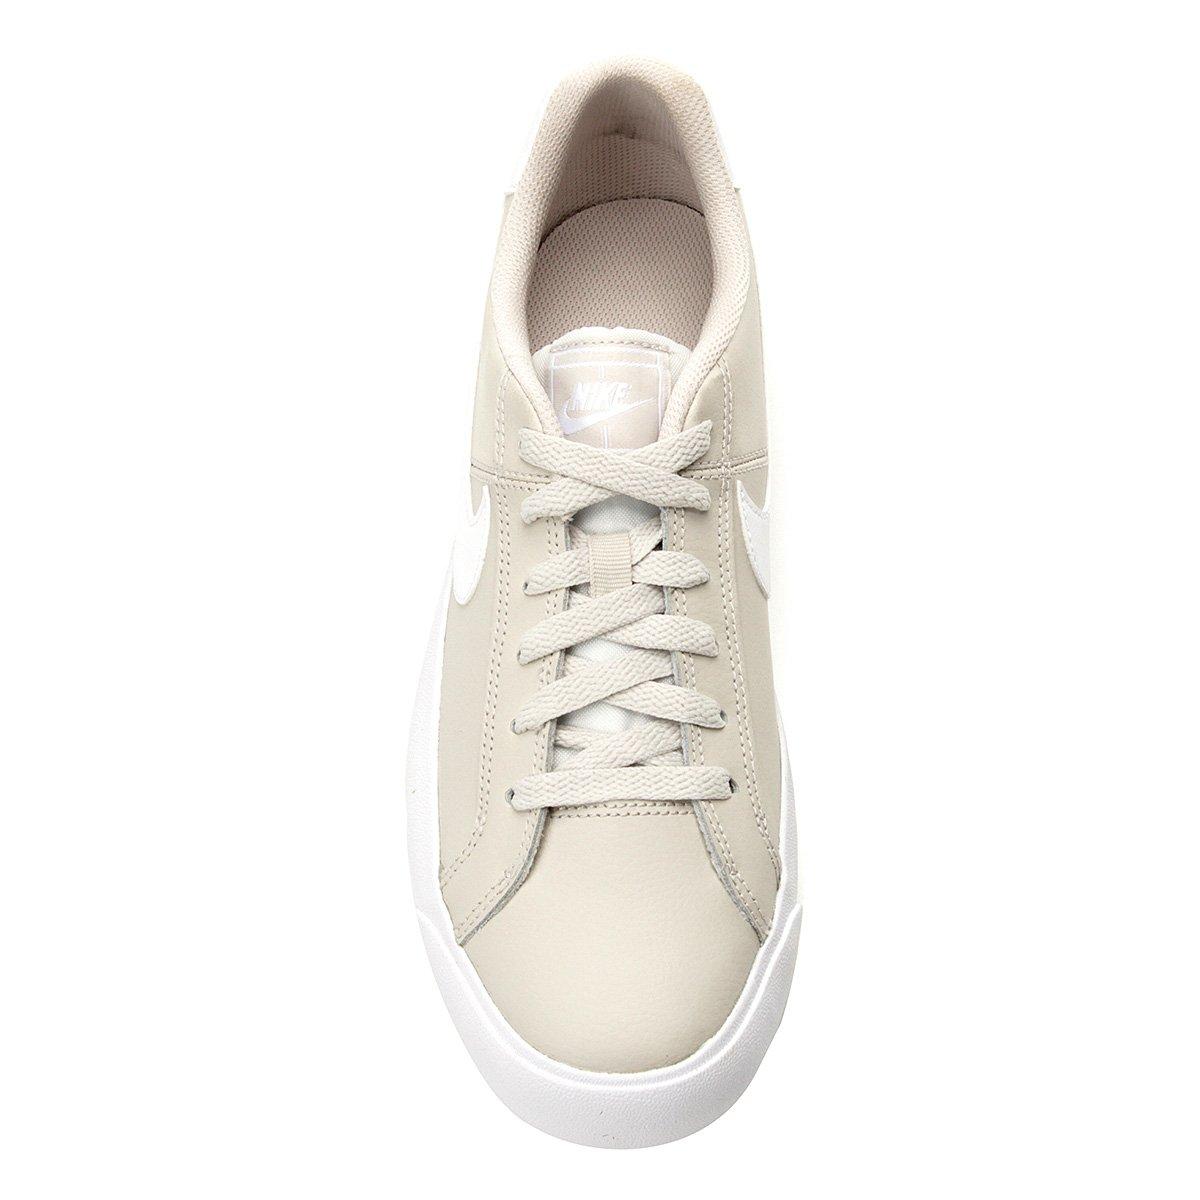 17b4b70c5e Tênis Nike Court Royale Ac Masculino - Tam: 39 - Shopping TudoAzul